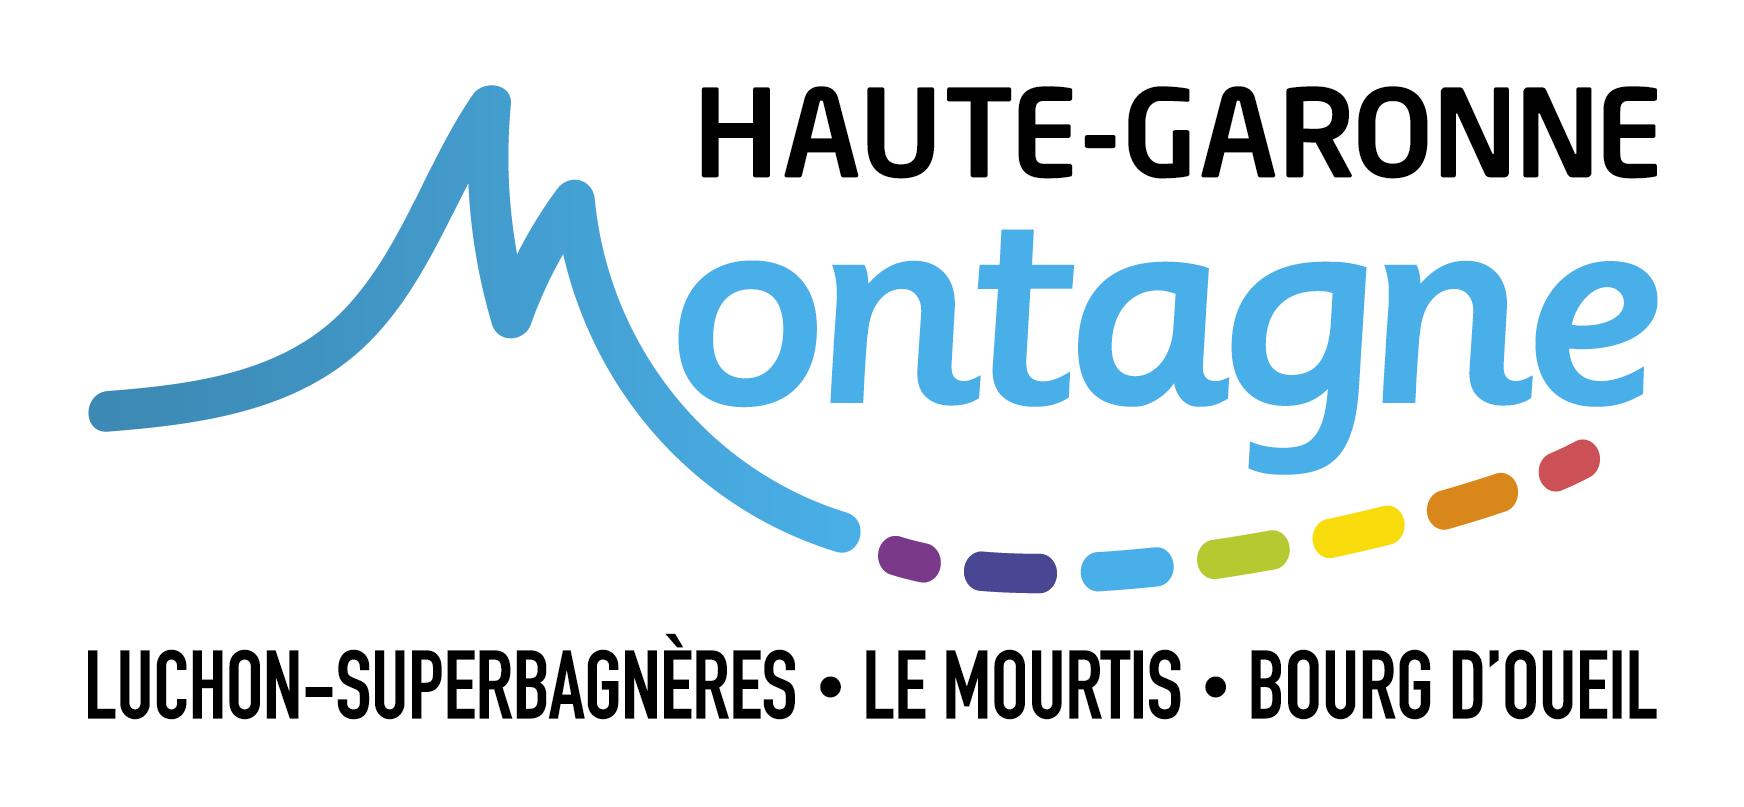 Stazione Luchon-Superbagnères